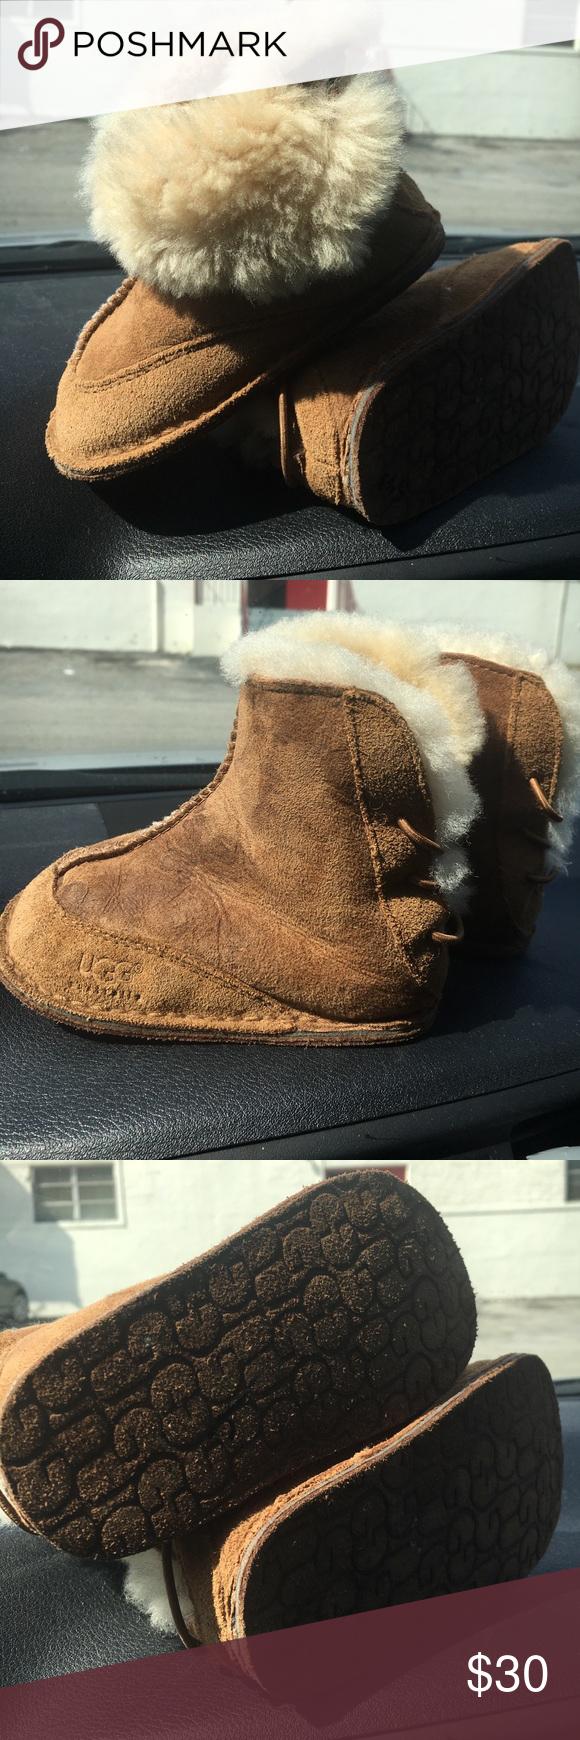 fa7d54742ea UGG BABY BOO Boot Suede Sheepskin Infant ~5206~ UGG Australia Baby ...